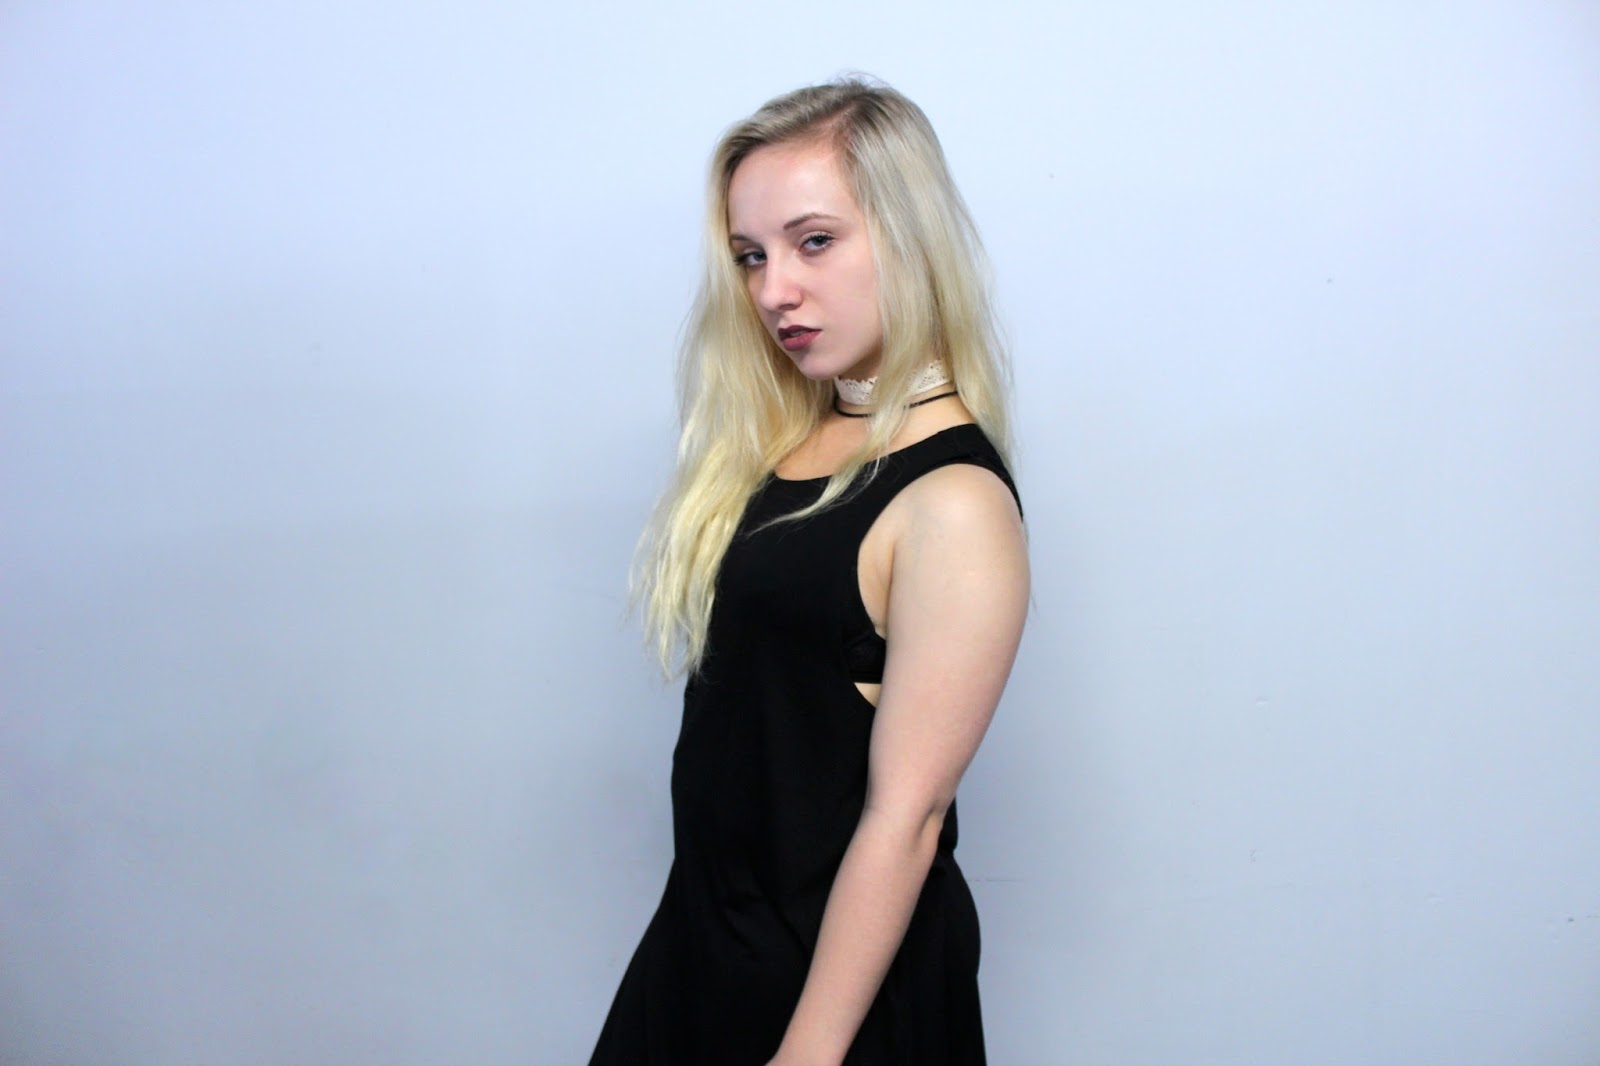 Black Dress - LacyLure